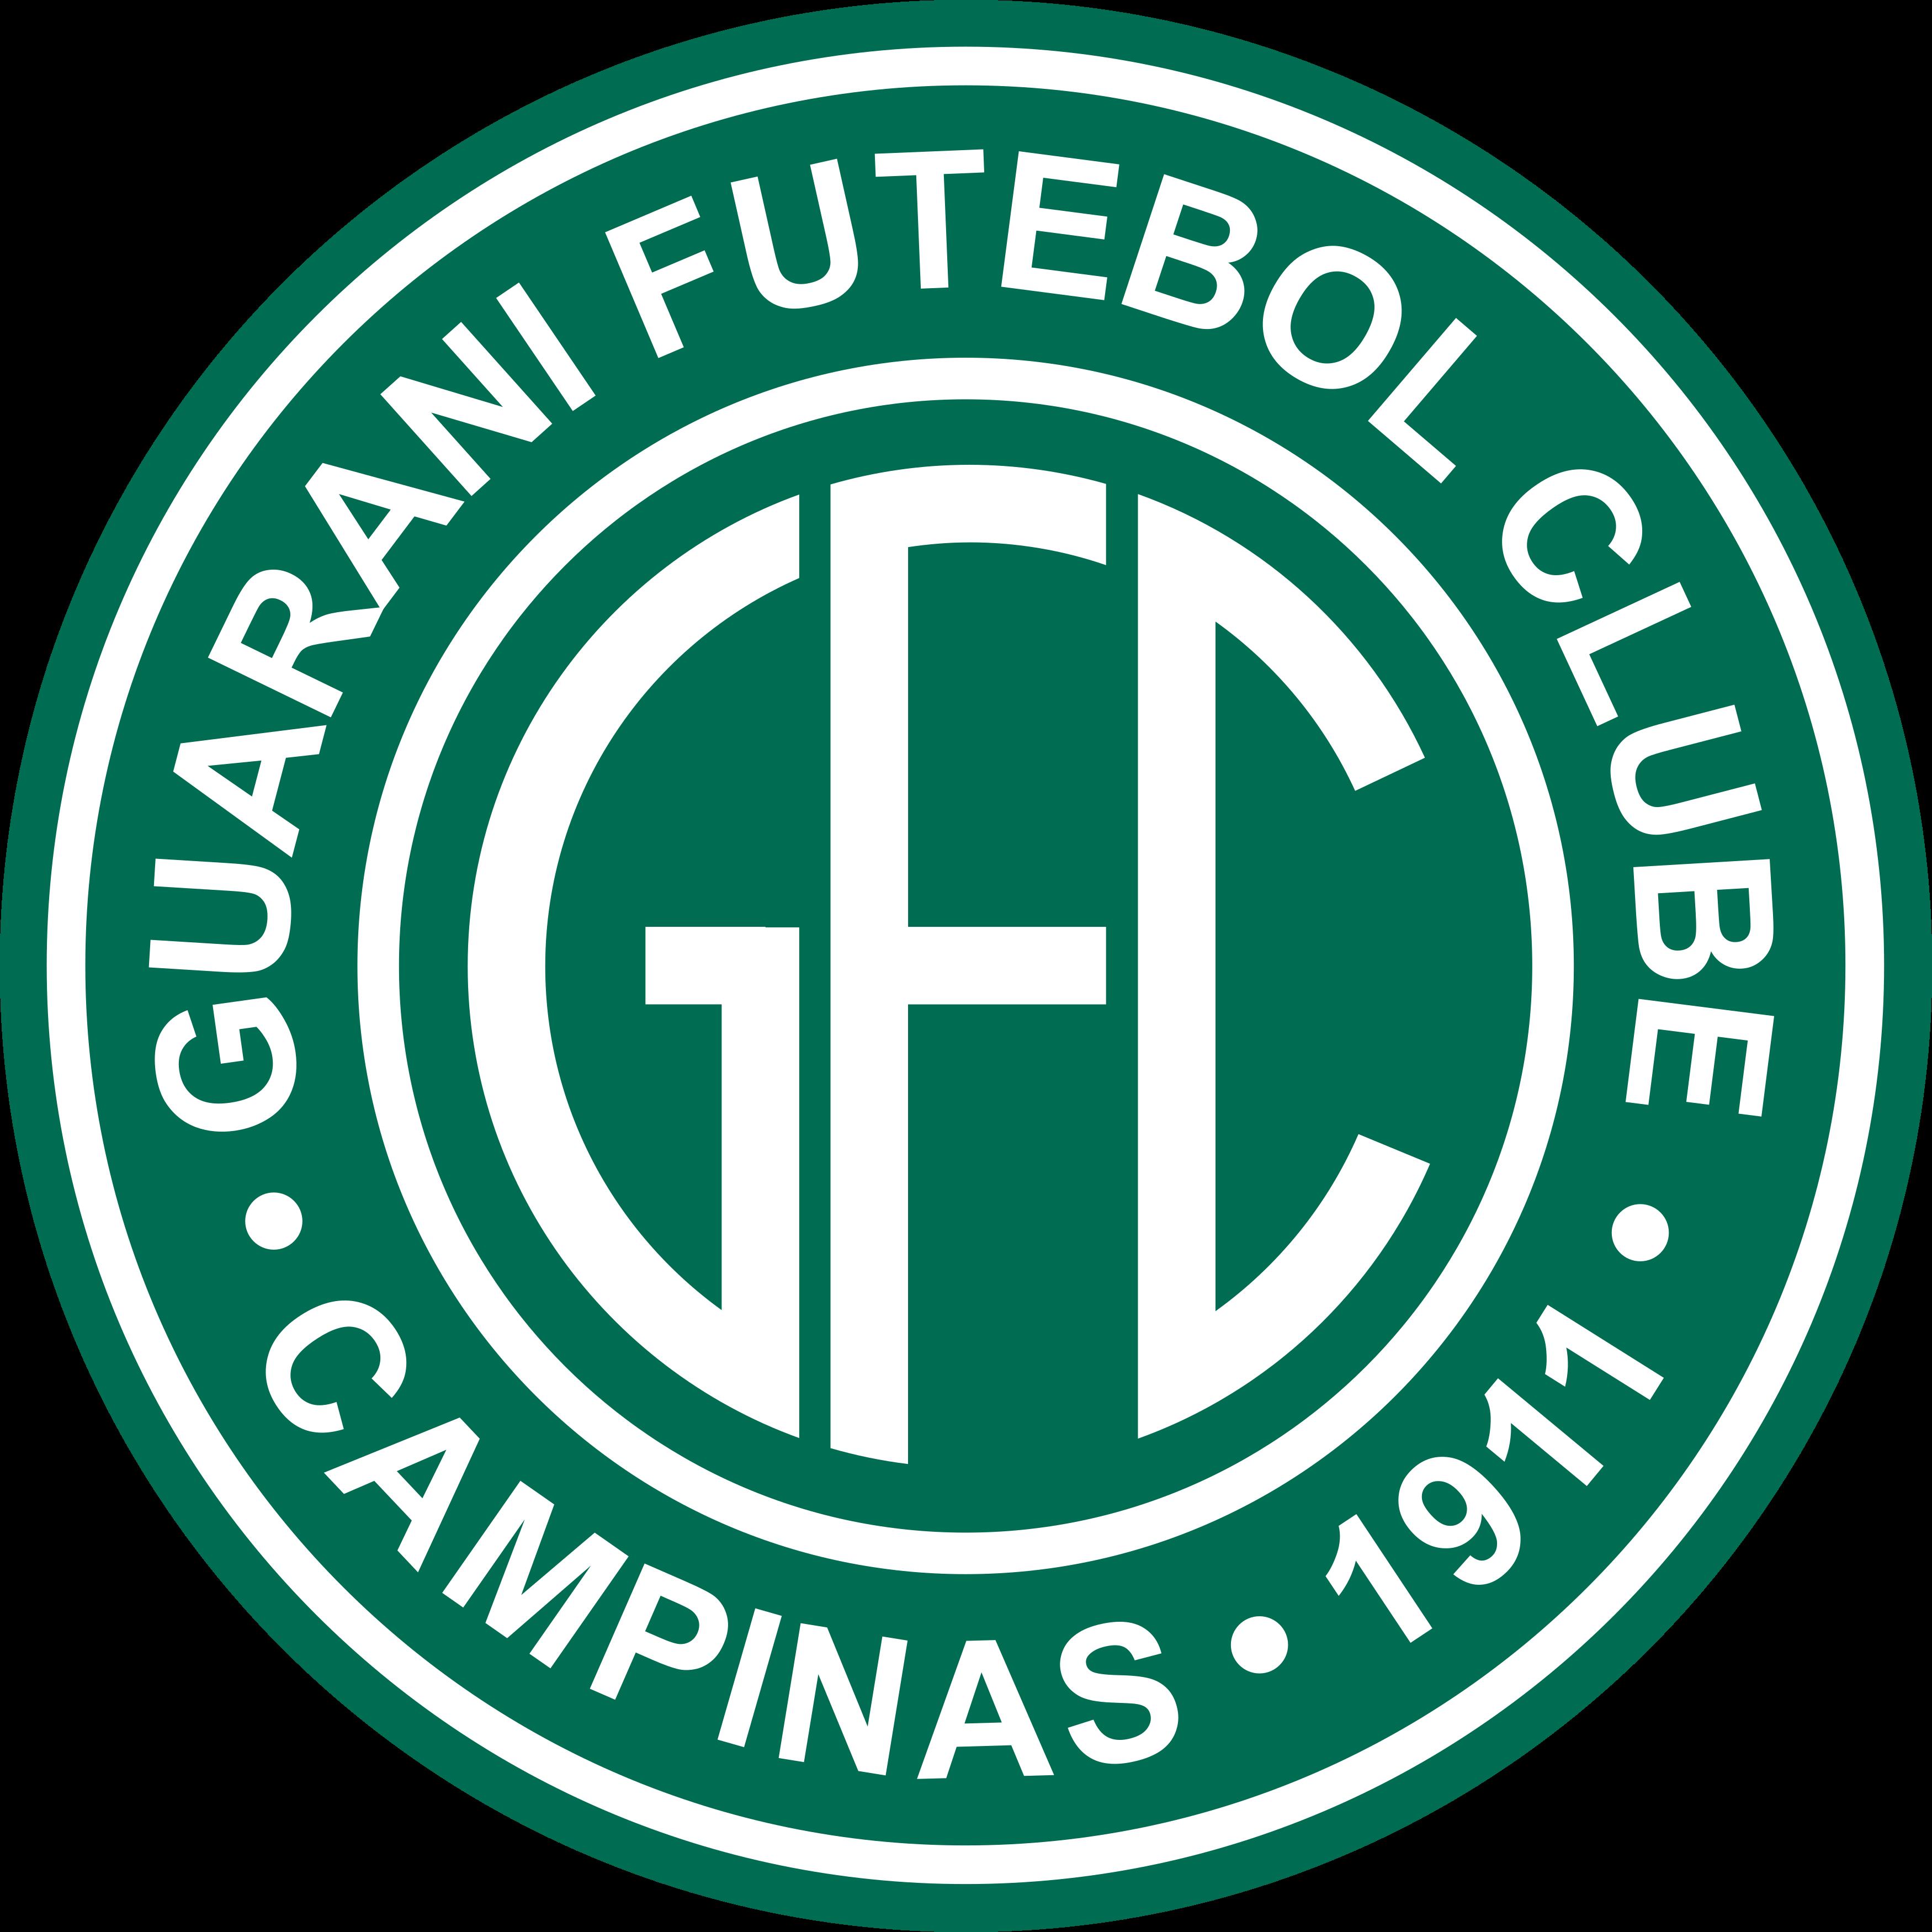 Guarani fc logo esudo 1 - Guarani FC Logo - Brasil